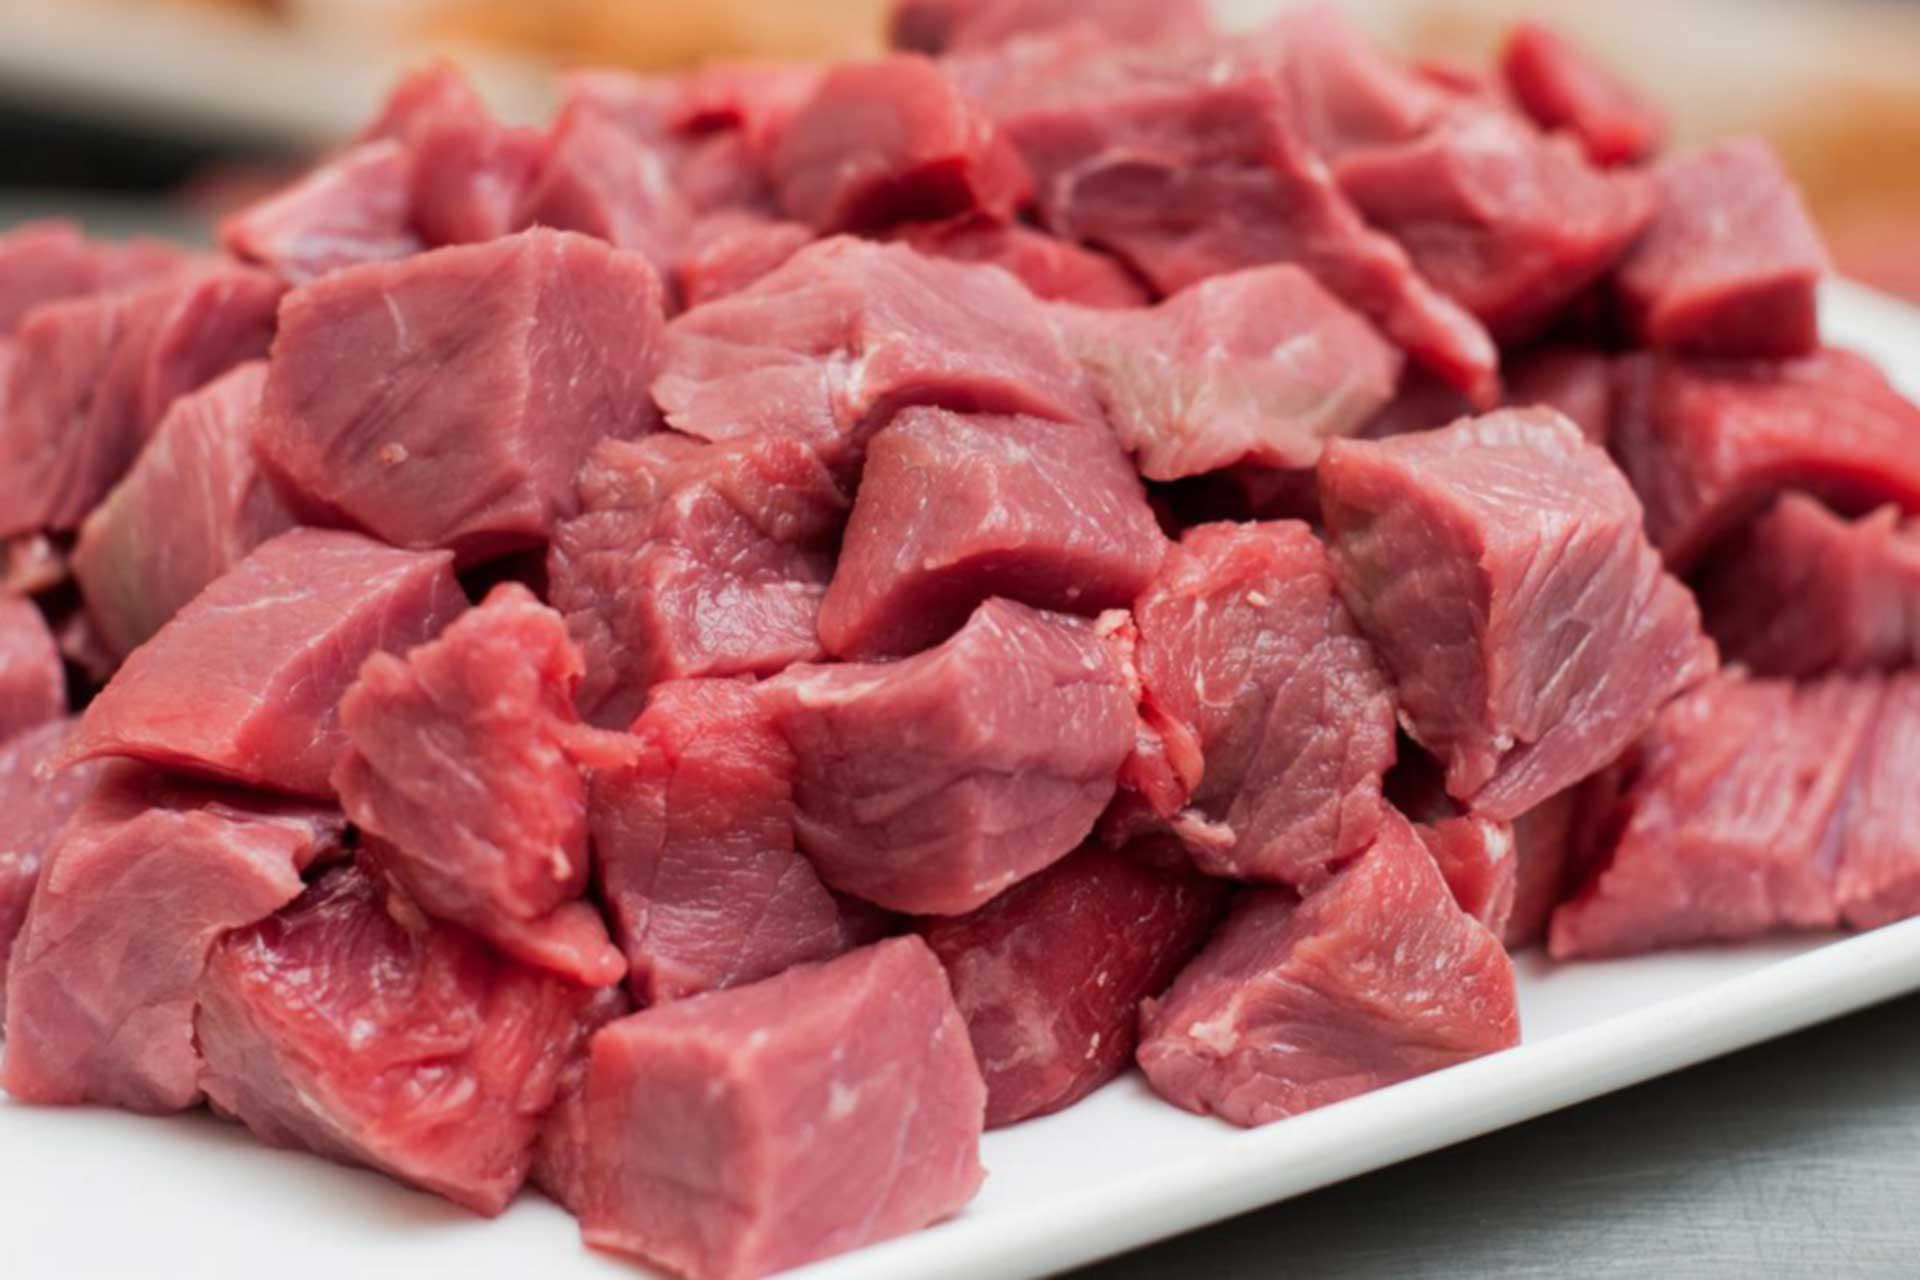 FMS-Series Frozen Meat Slicer